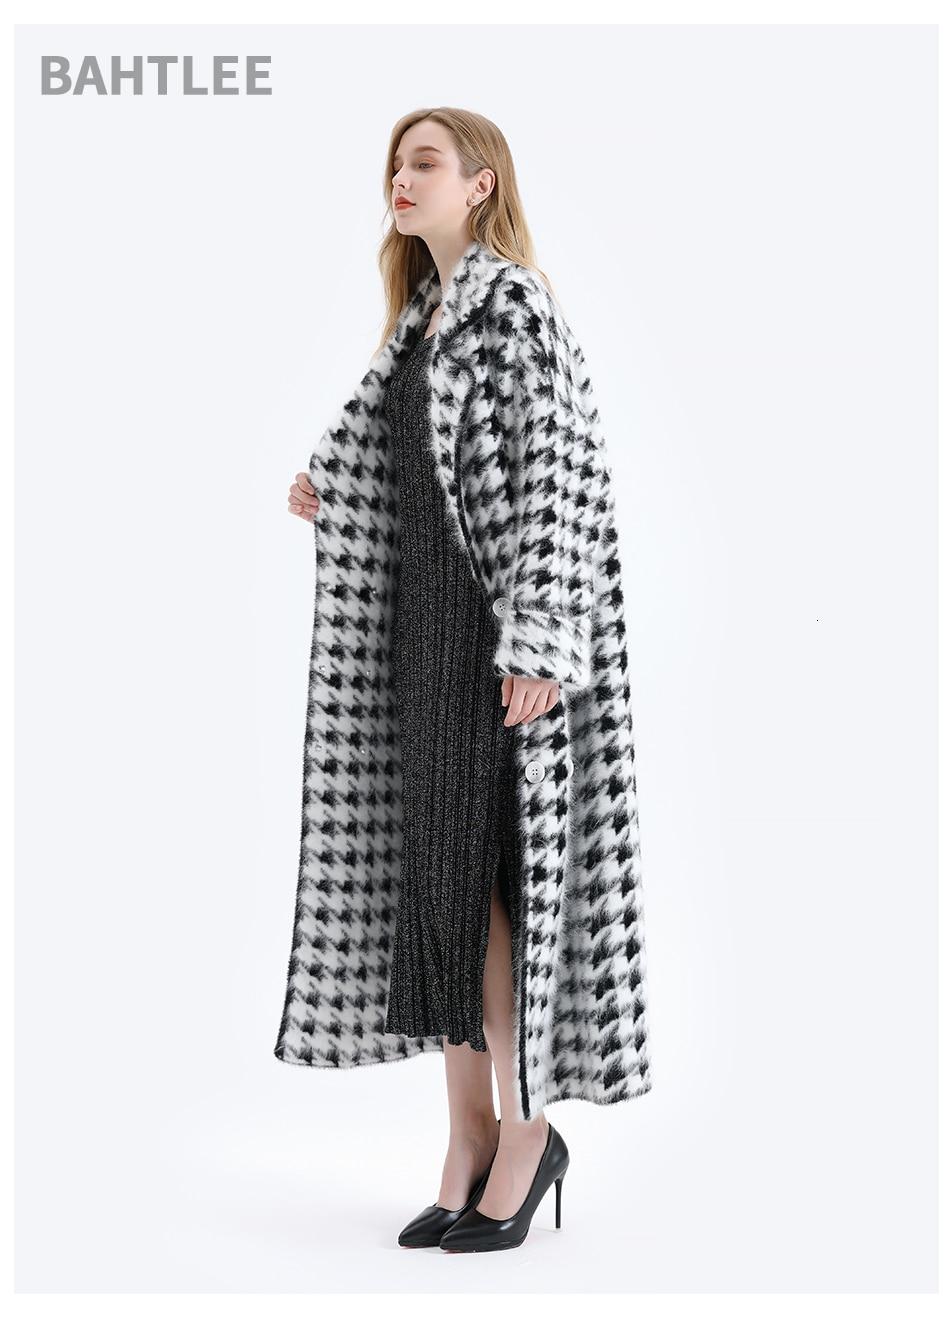 BAHTLEE Women Angora Long Coat Houndstooth Pattern Sweater Winter Wool Knitted Cardigans Jumper Turn Down Collar Long Sleeves 7